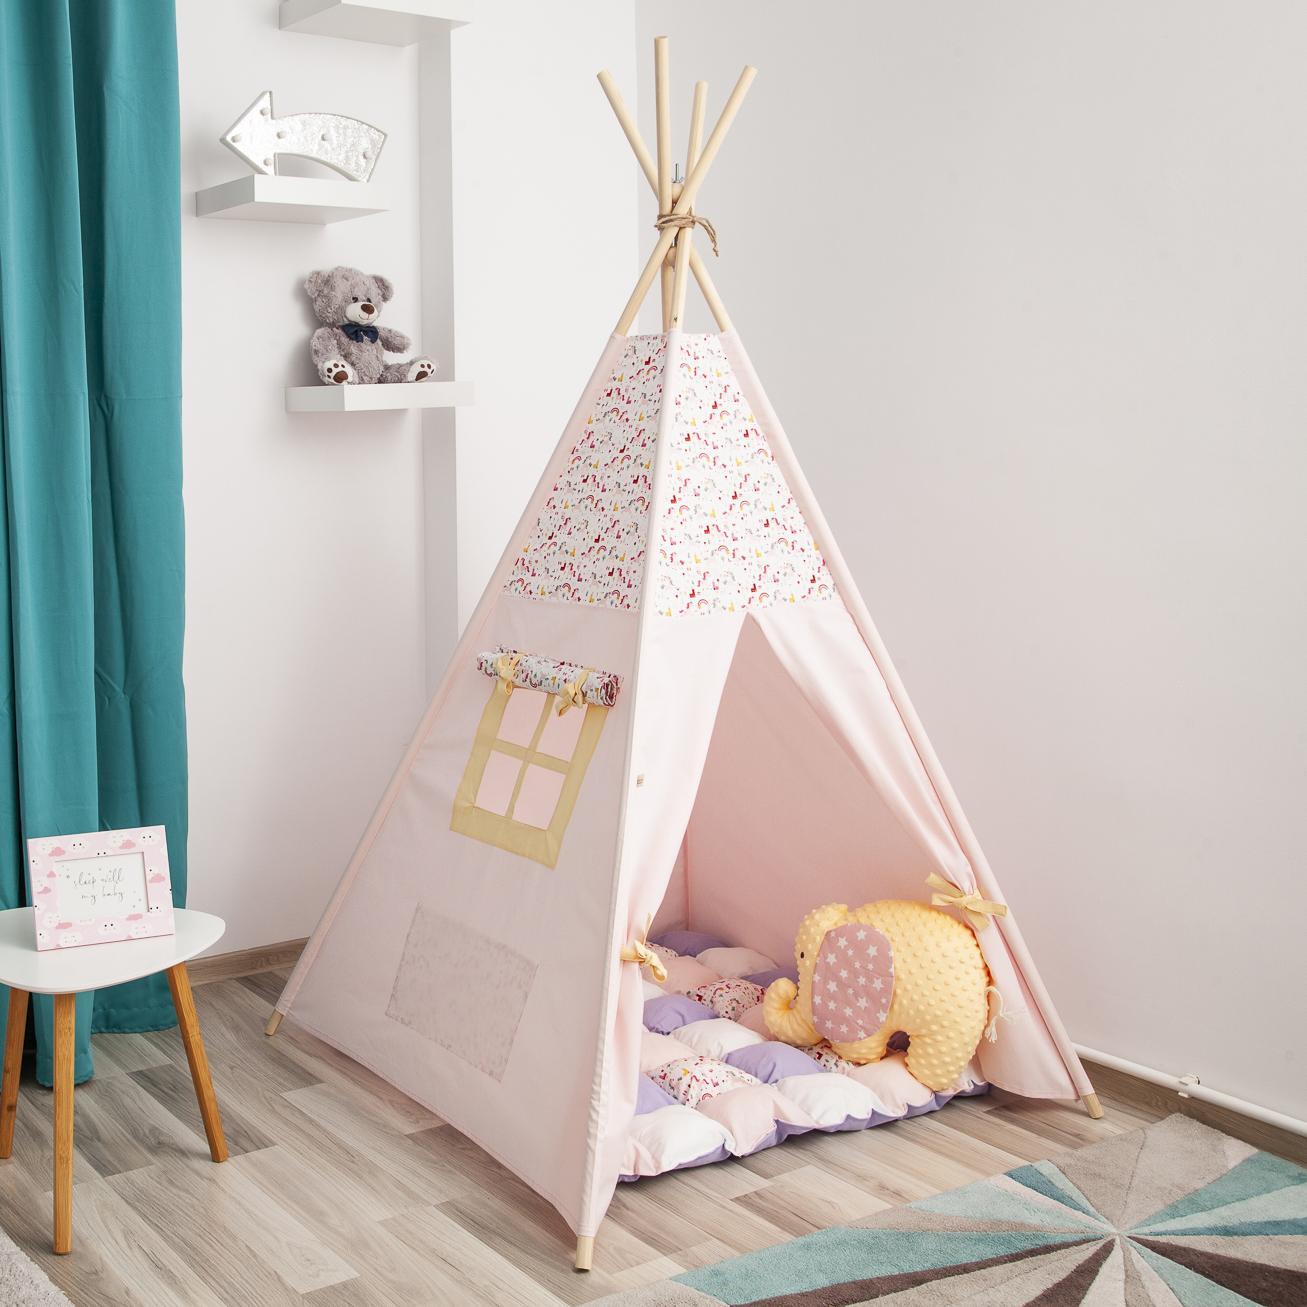 PINK ANIMALS - cort teepee cu salteluță premium inclusă